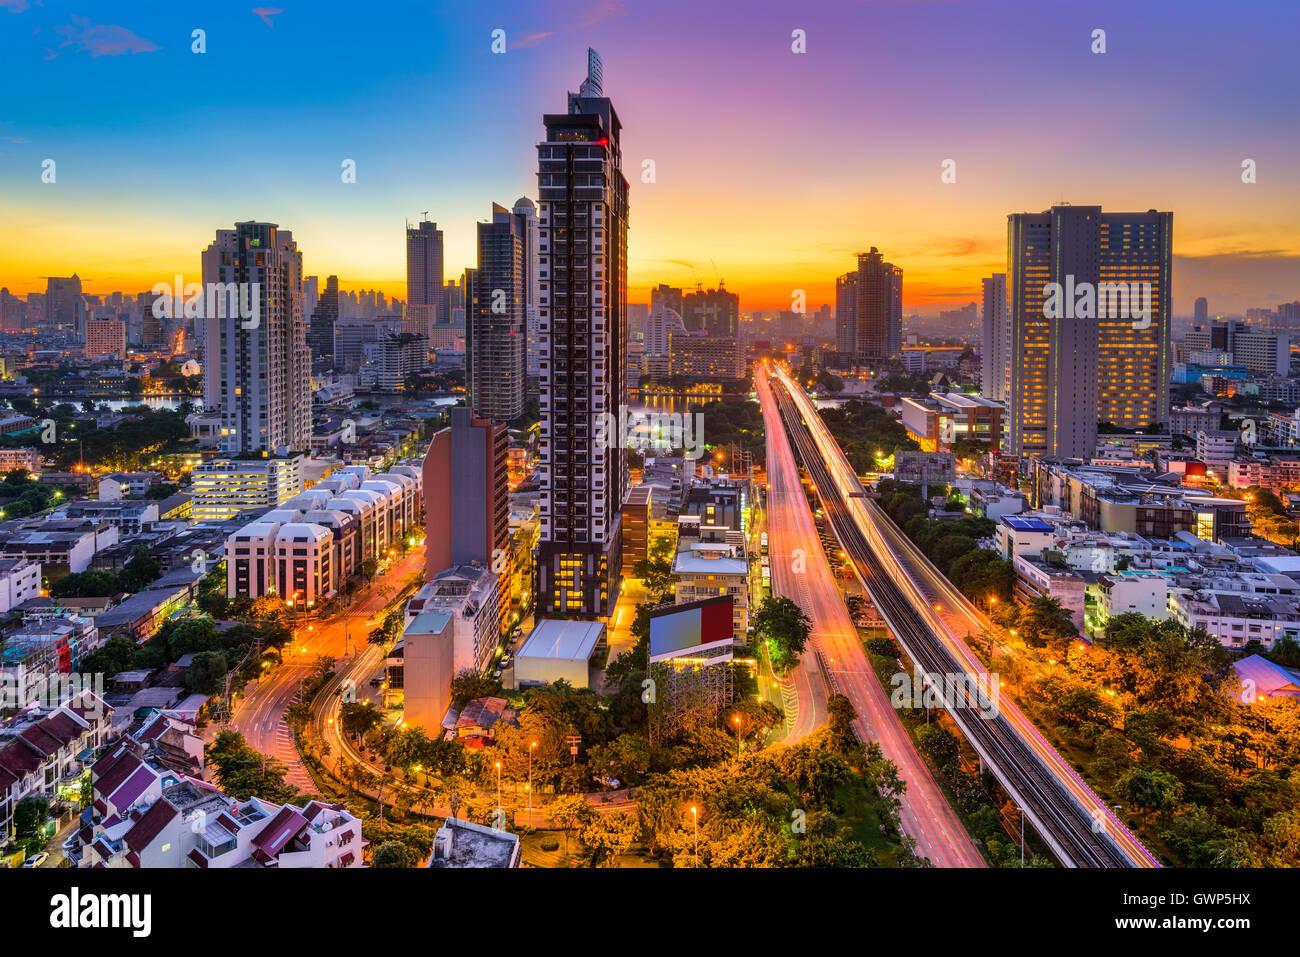 Bangkok, Thailand skyline from Krung Thon Buri. - Stock Image